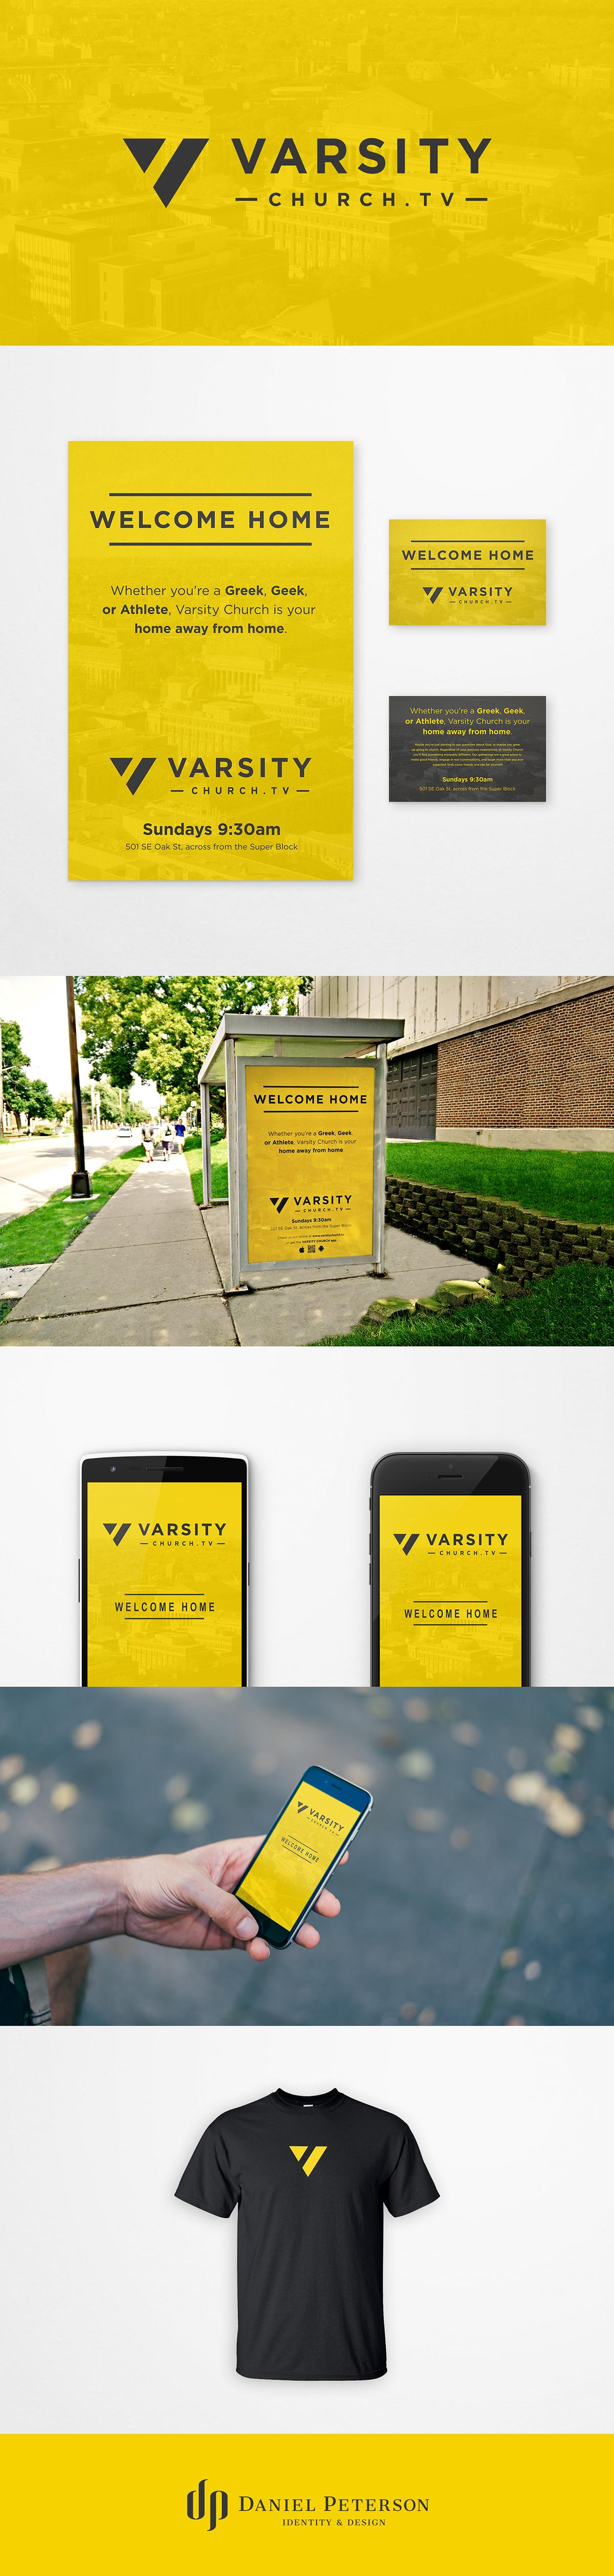 Varsity Church [University of Minnesota] Identity by Daniel Peterson